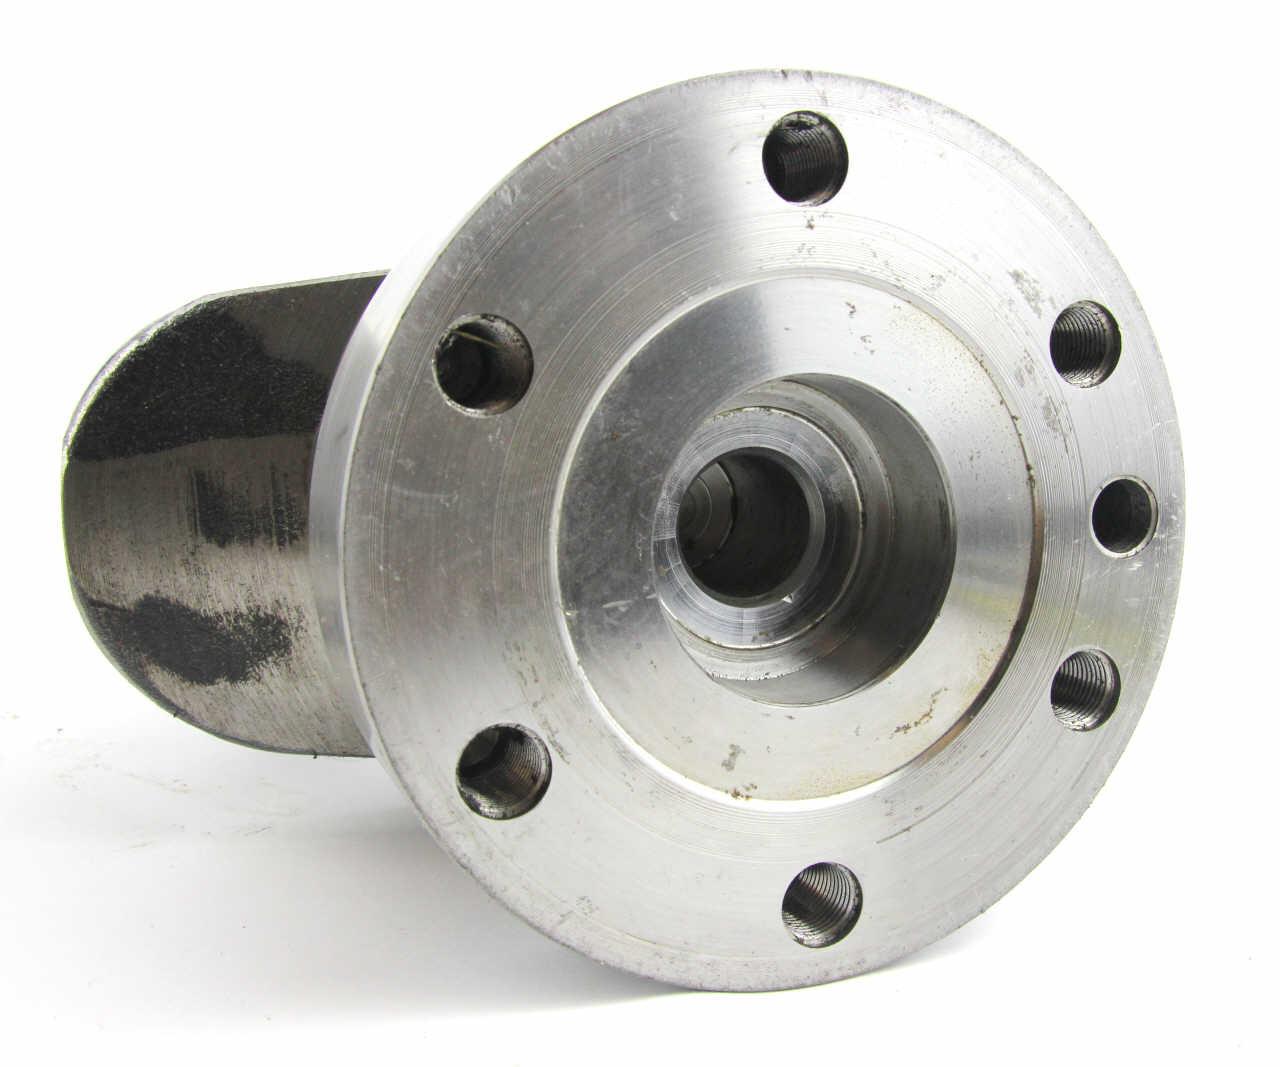 Perkins 4.248 Crankshaft Kit from parts4engines.com Crankshaft Rear